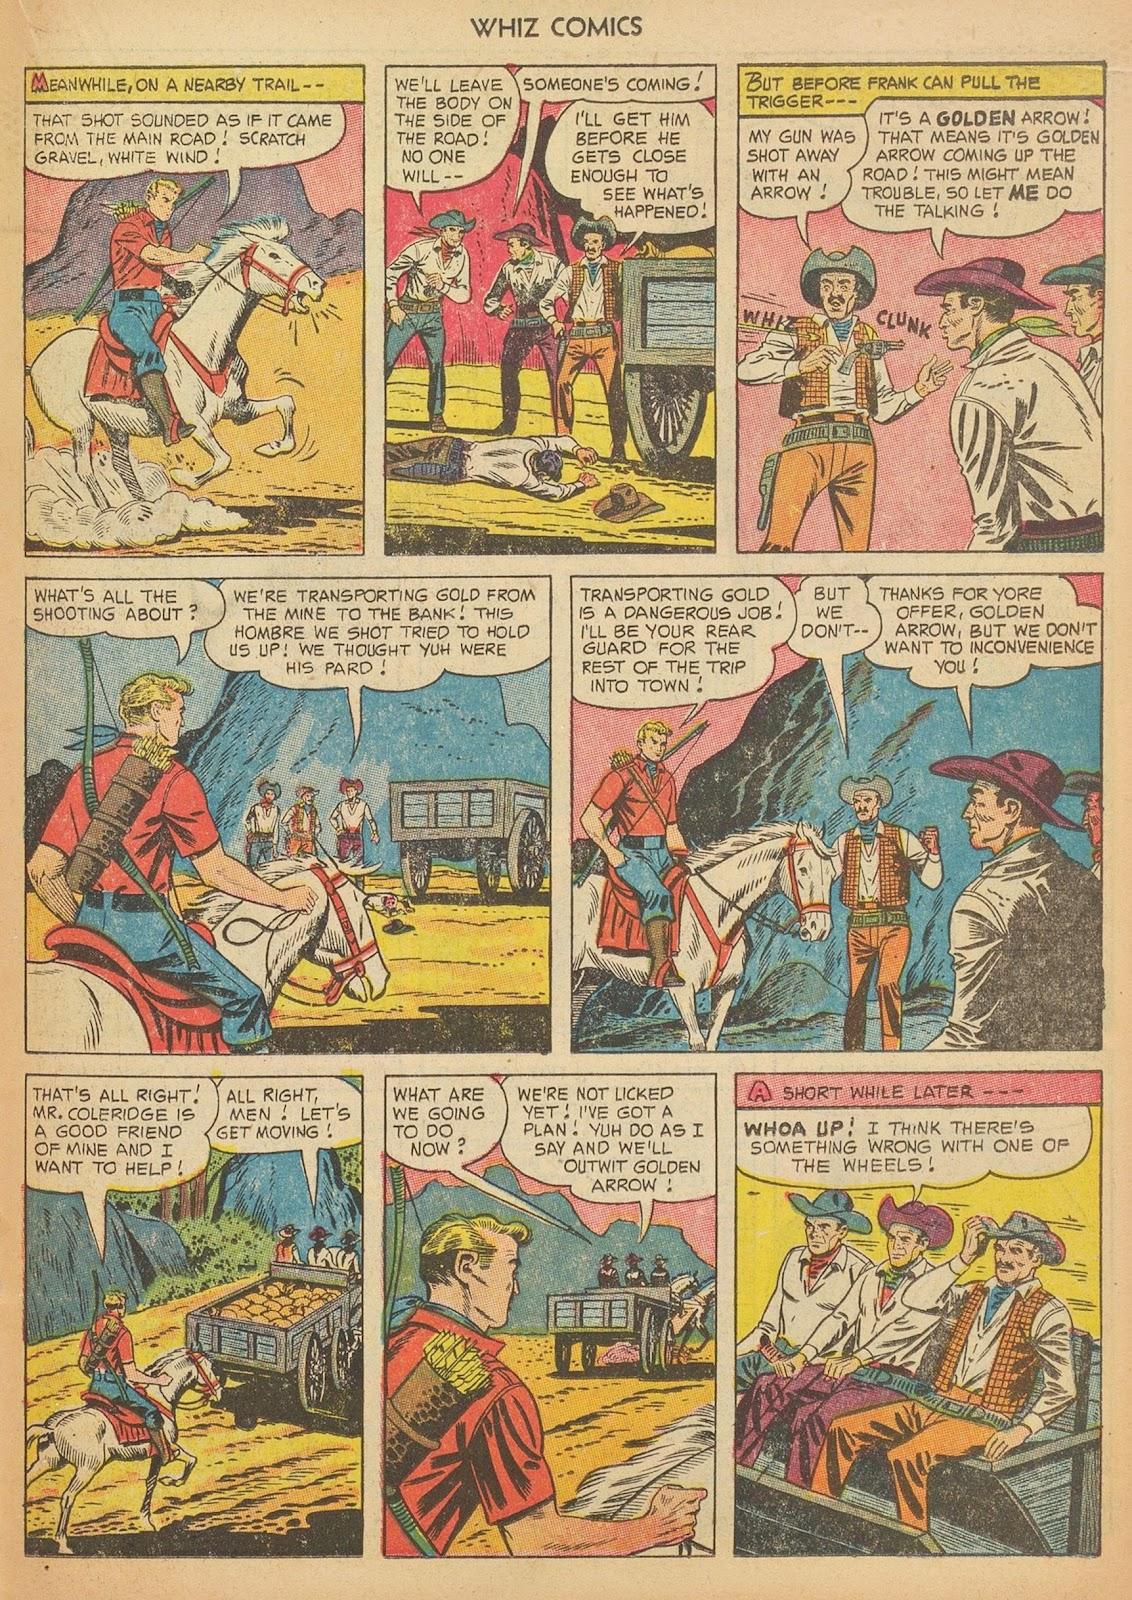 Read online WHIZ Comics comic -  Issue #153 - 19